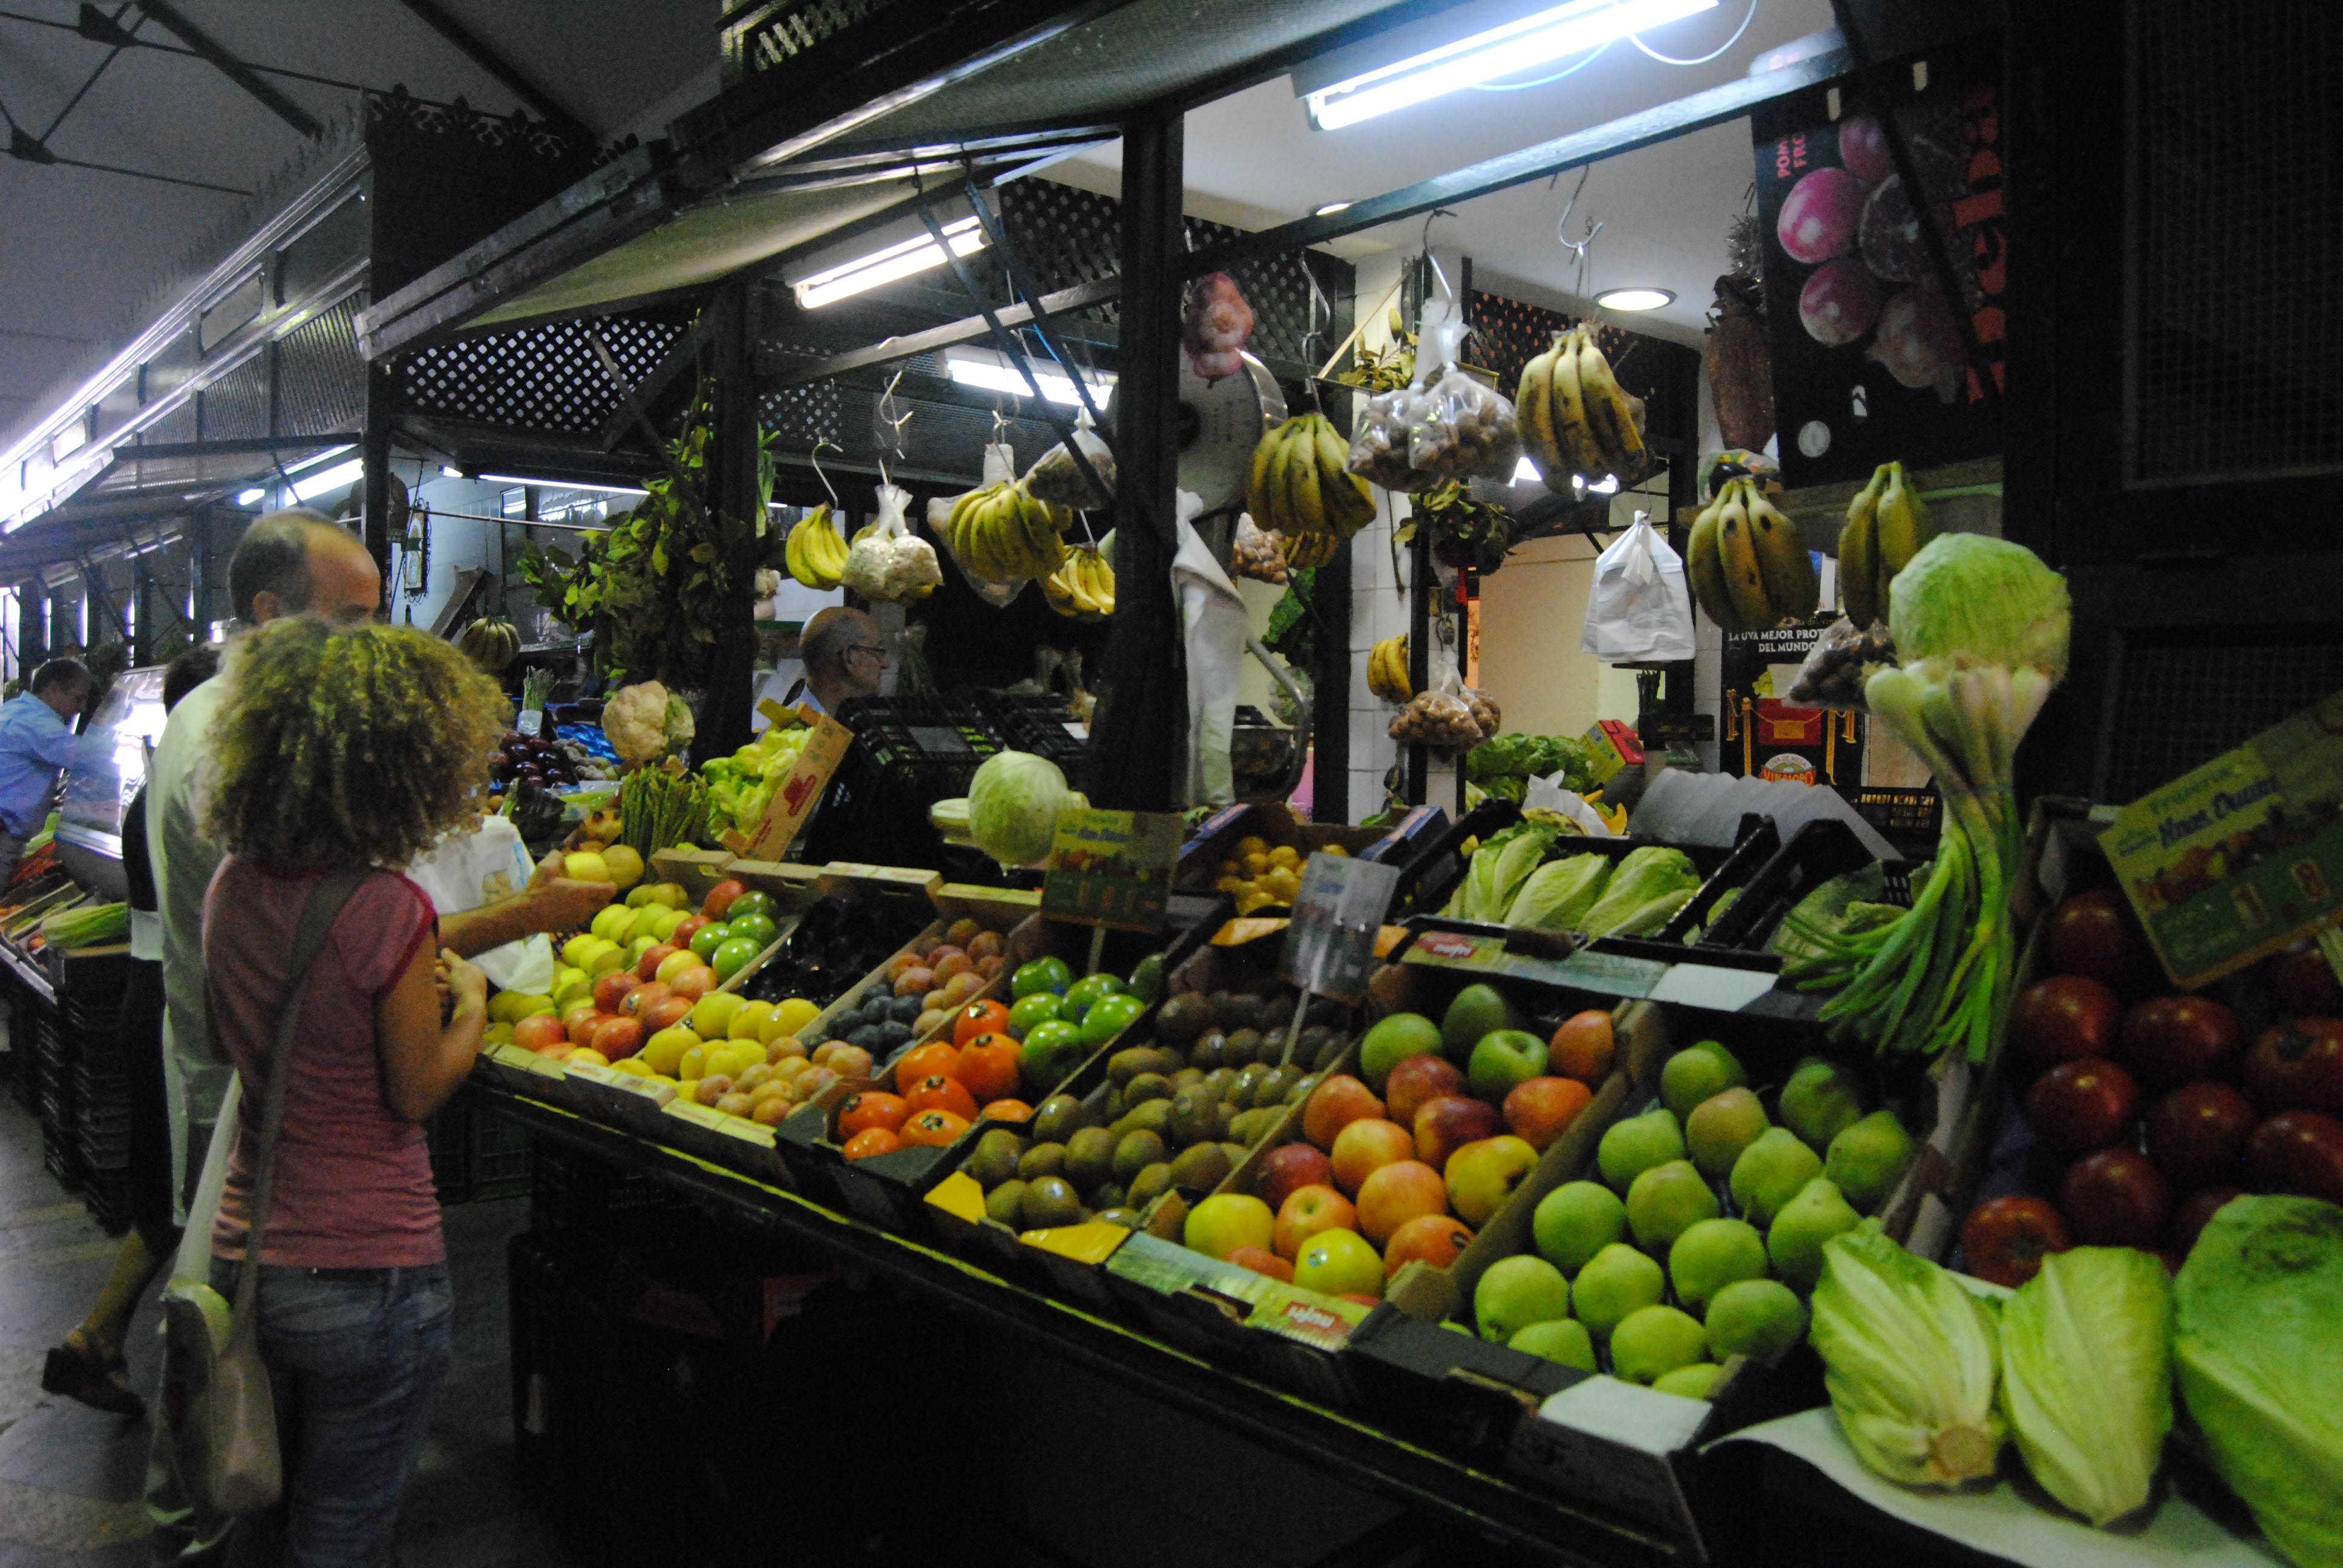 Mercado de Feria in Sevilla